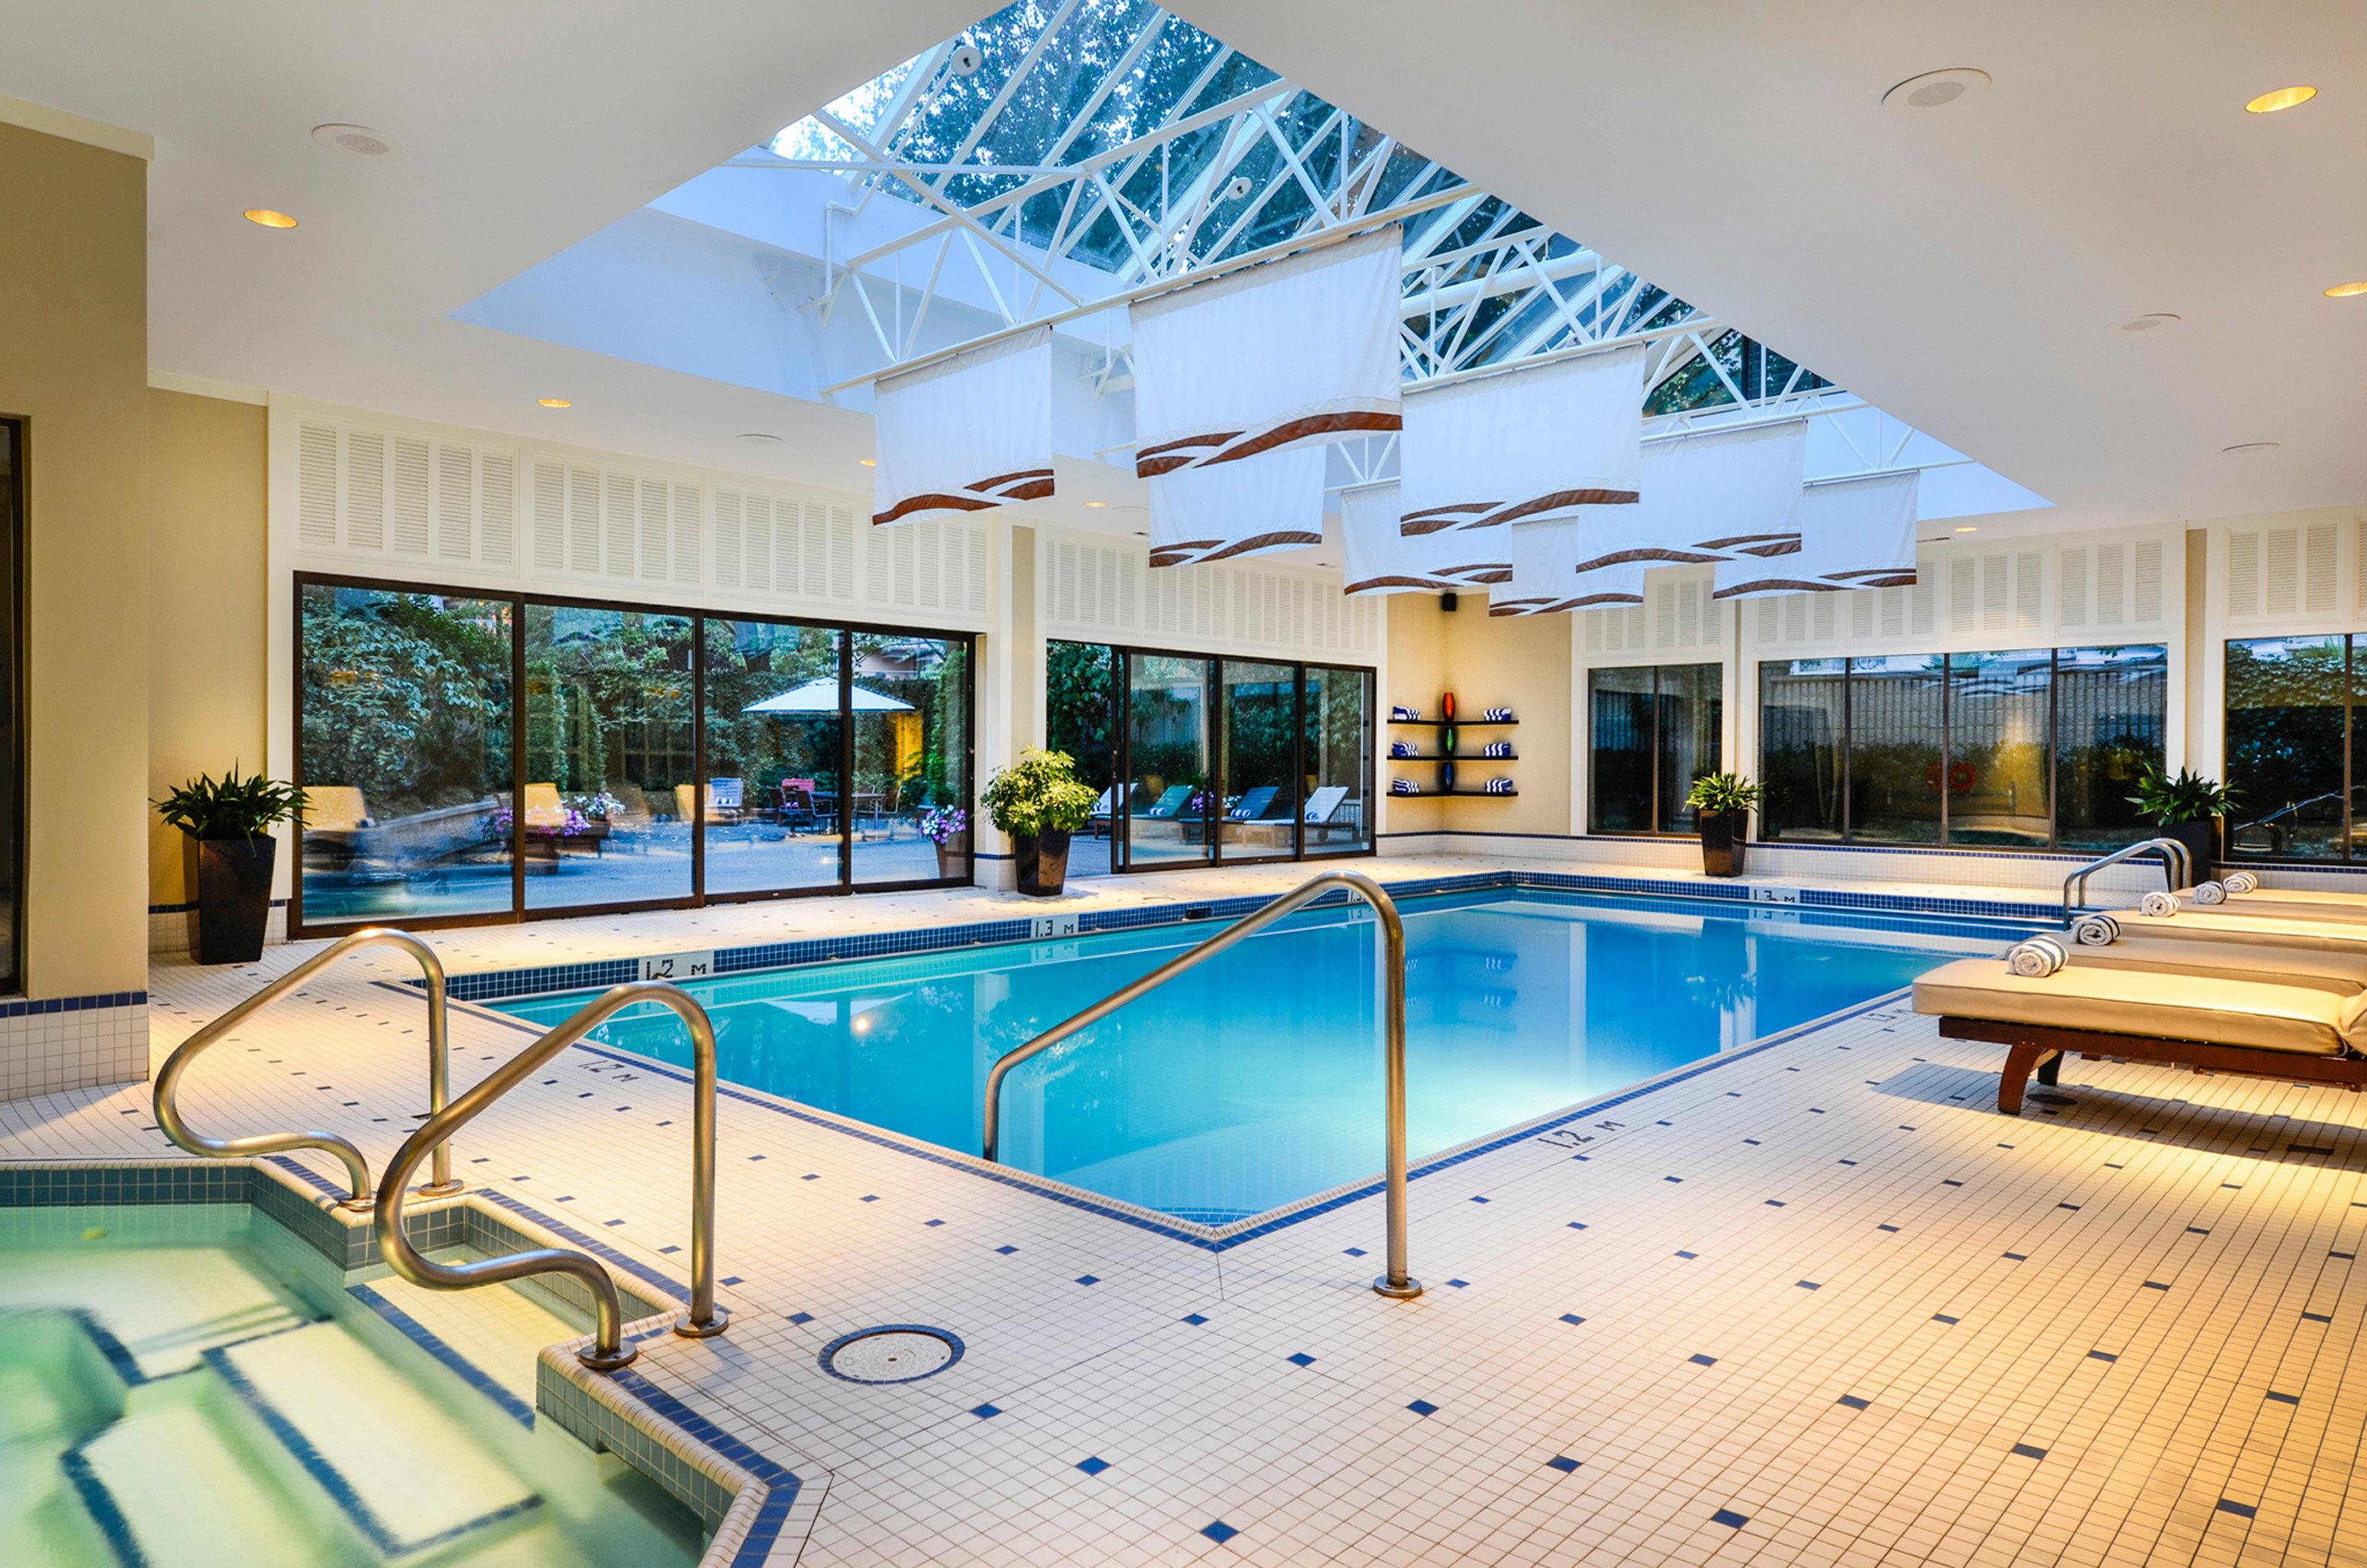 Classic Elegant Hot tub Hot tub/Jacuzzi Lounge Luxury Patio Pool swimming pool leisure property Resort condominium leisure centre home Villa convention center Lobby mansion recreation room blue